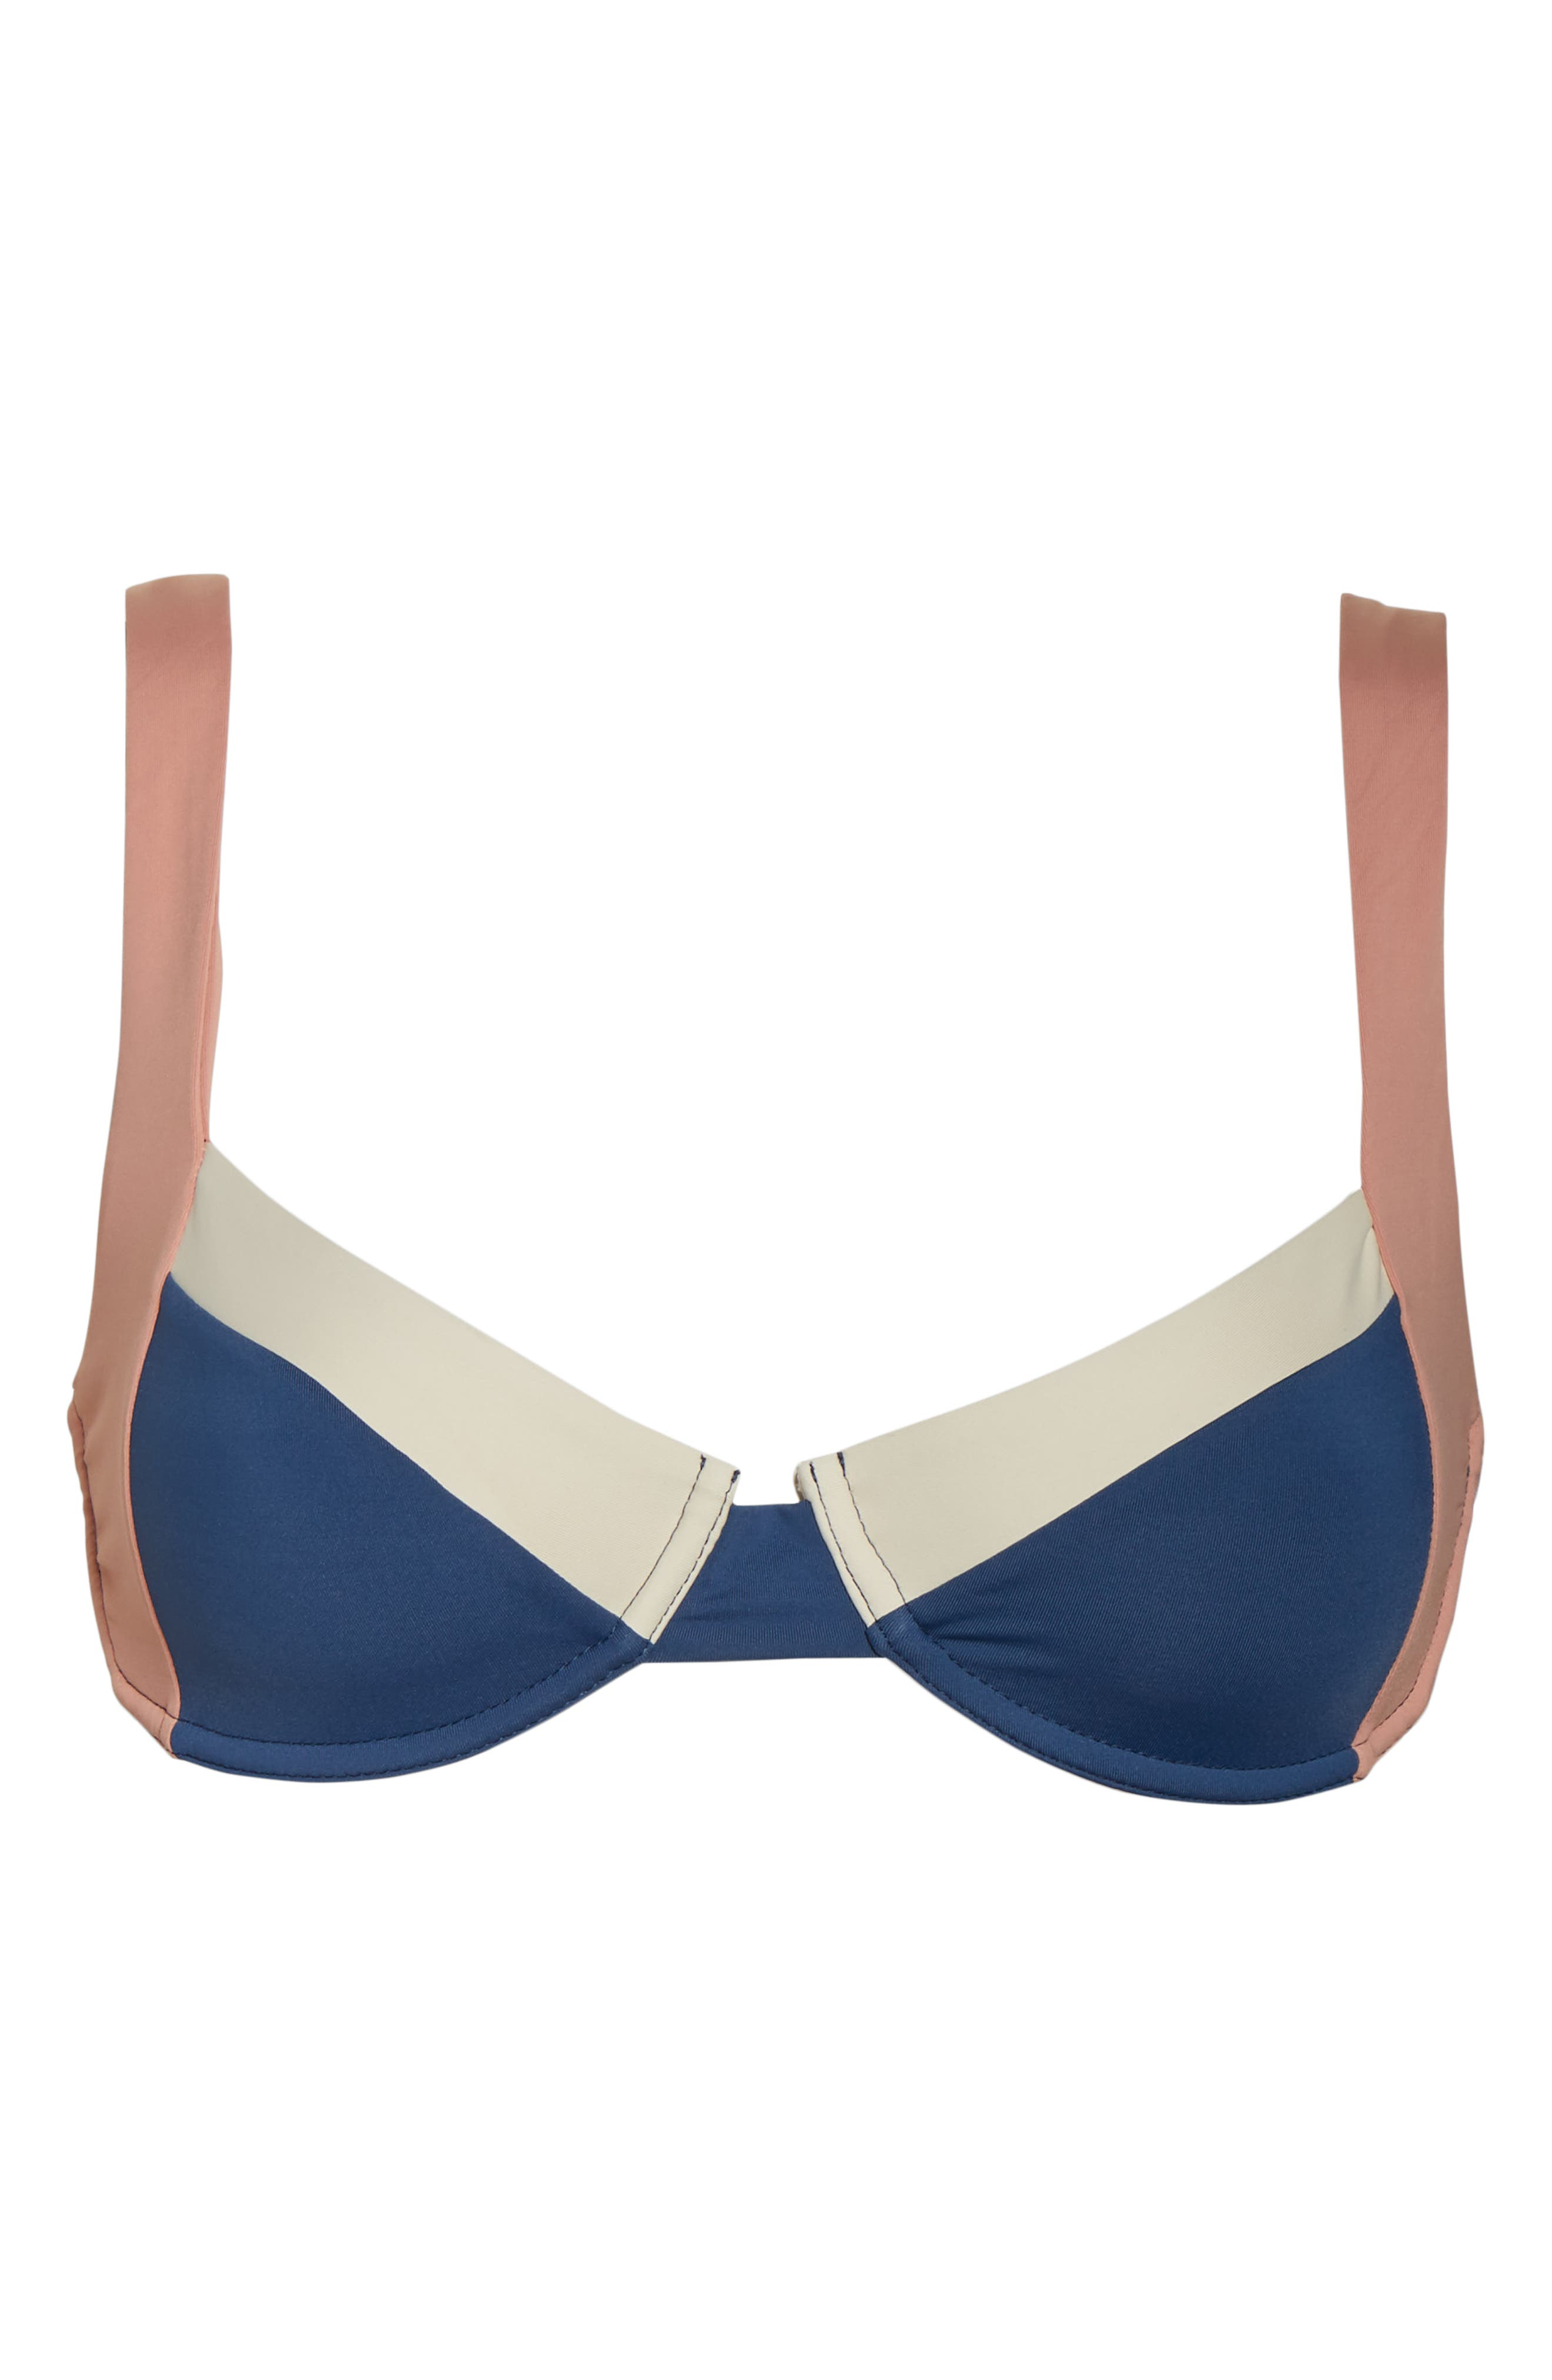 TAVIK, Sawyer Underwire Bikini Top, Alternate thumbnail 6, color, COASTAL BLUE/ DESERT ROSE